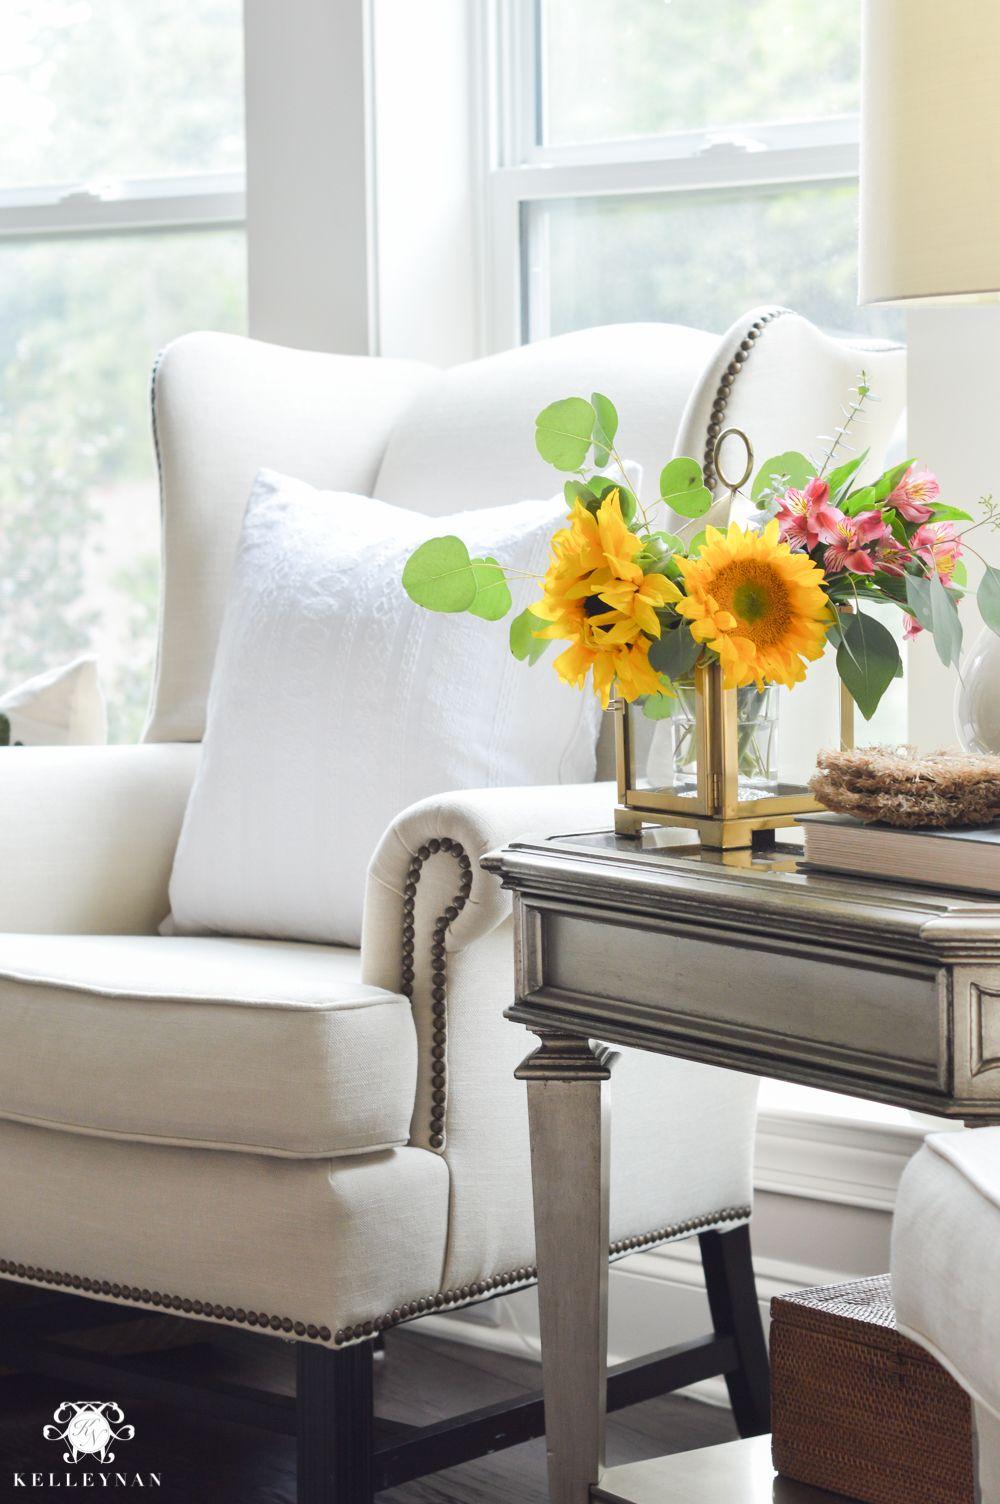 Floral Arrangement Ideas Using Lanterns | Wingback chairs, Floral ...